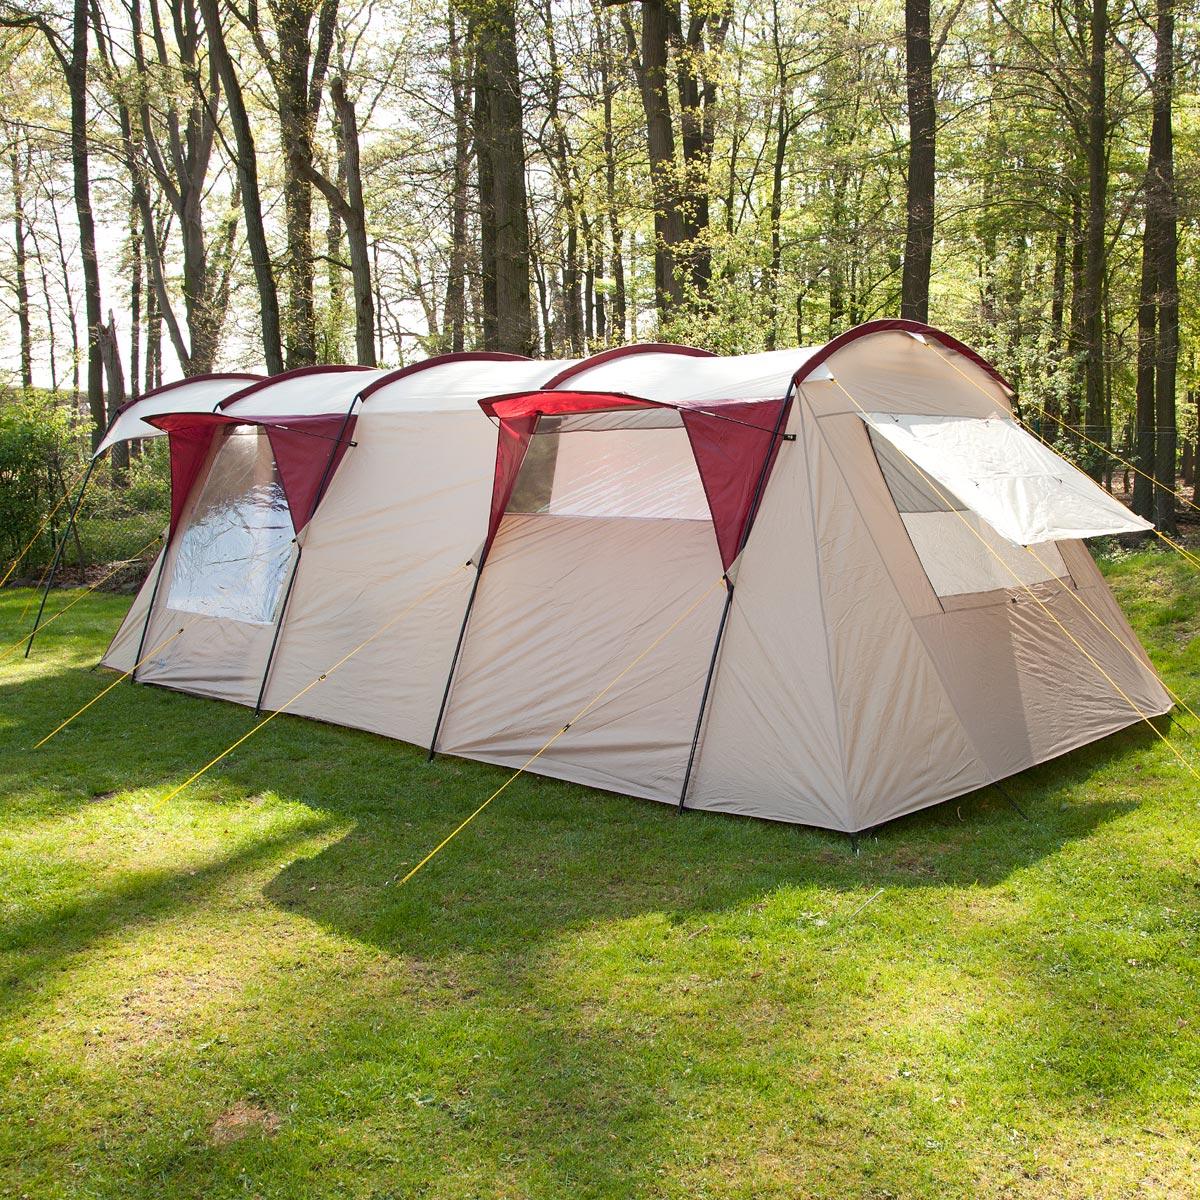 skandika trondheim 5 personen camping zelt gruppenzelt neu. Black Bedroom Furniture Sets. Home Design Ideas